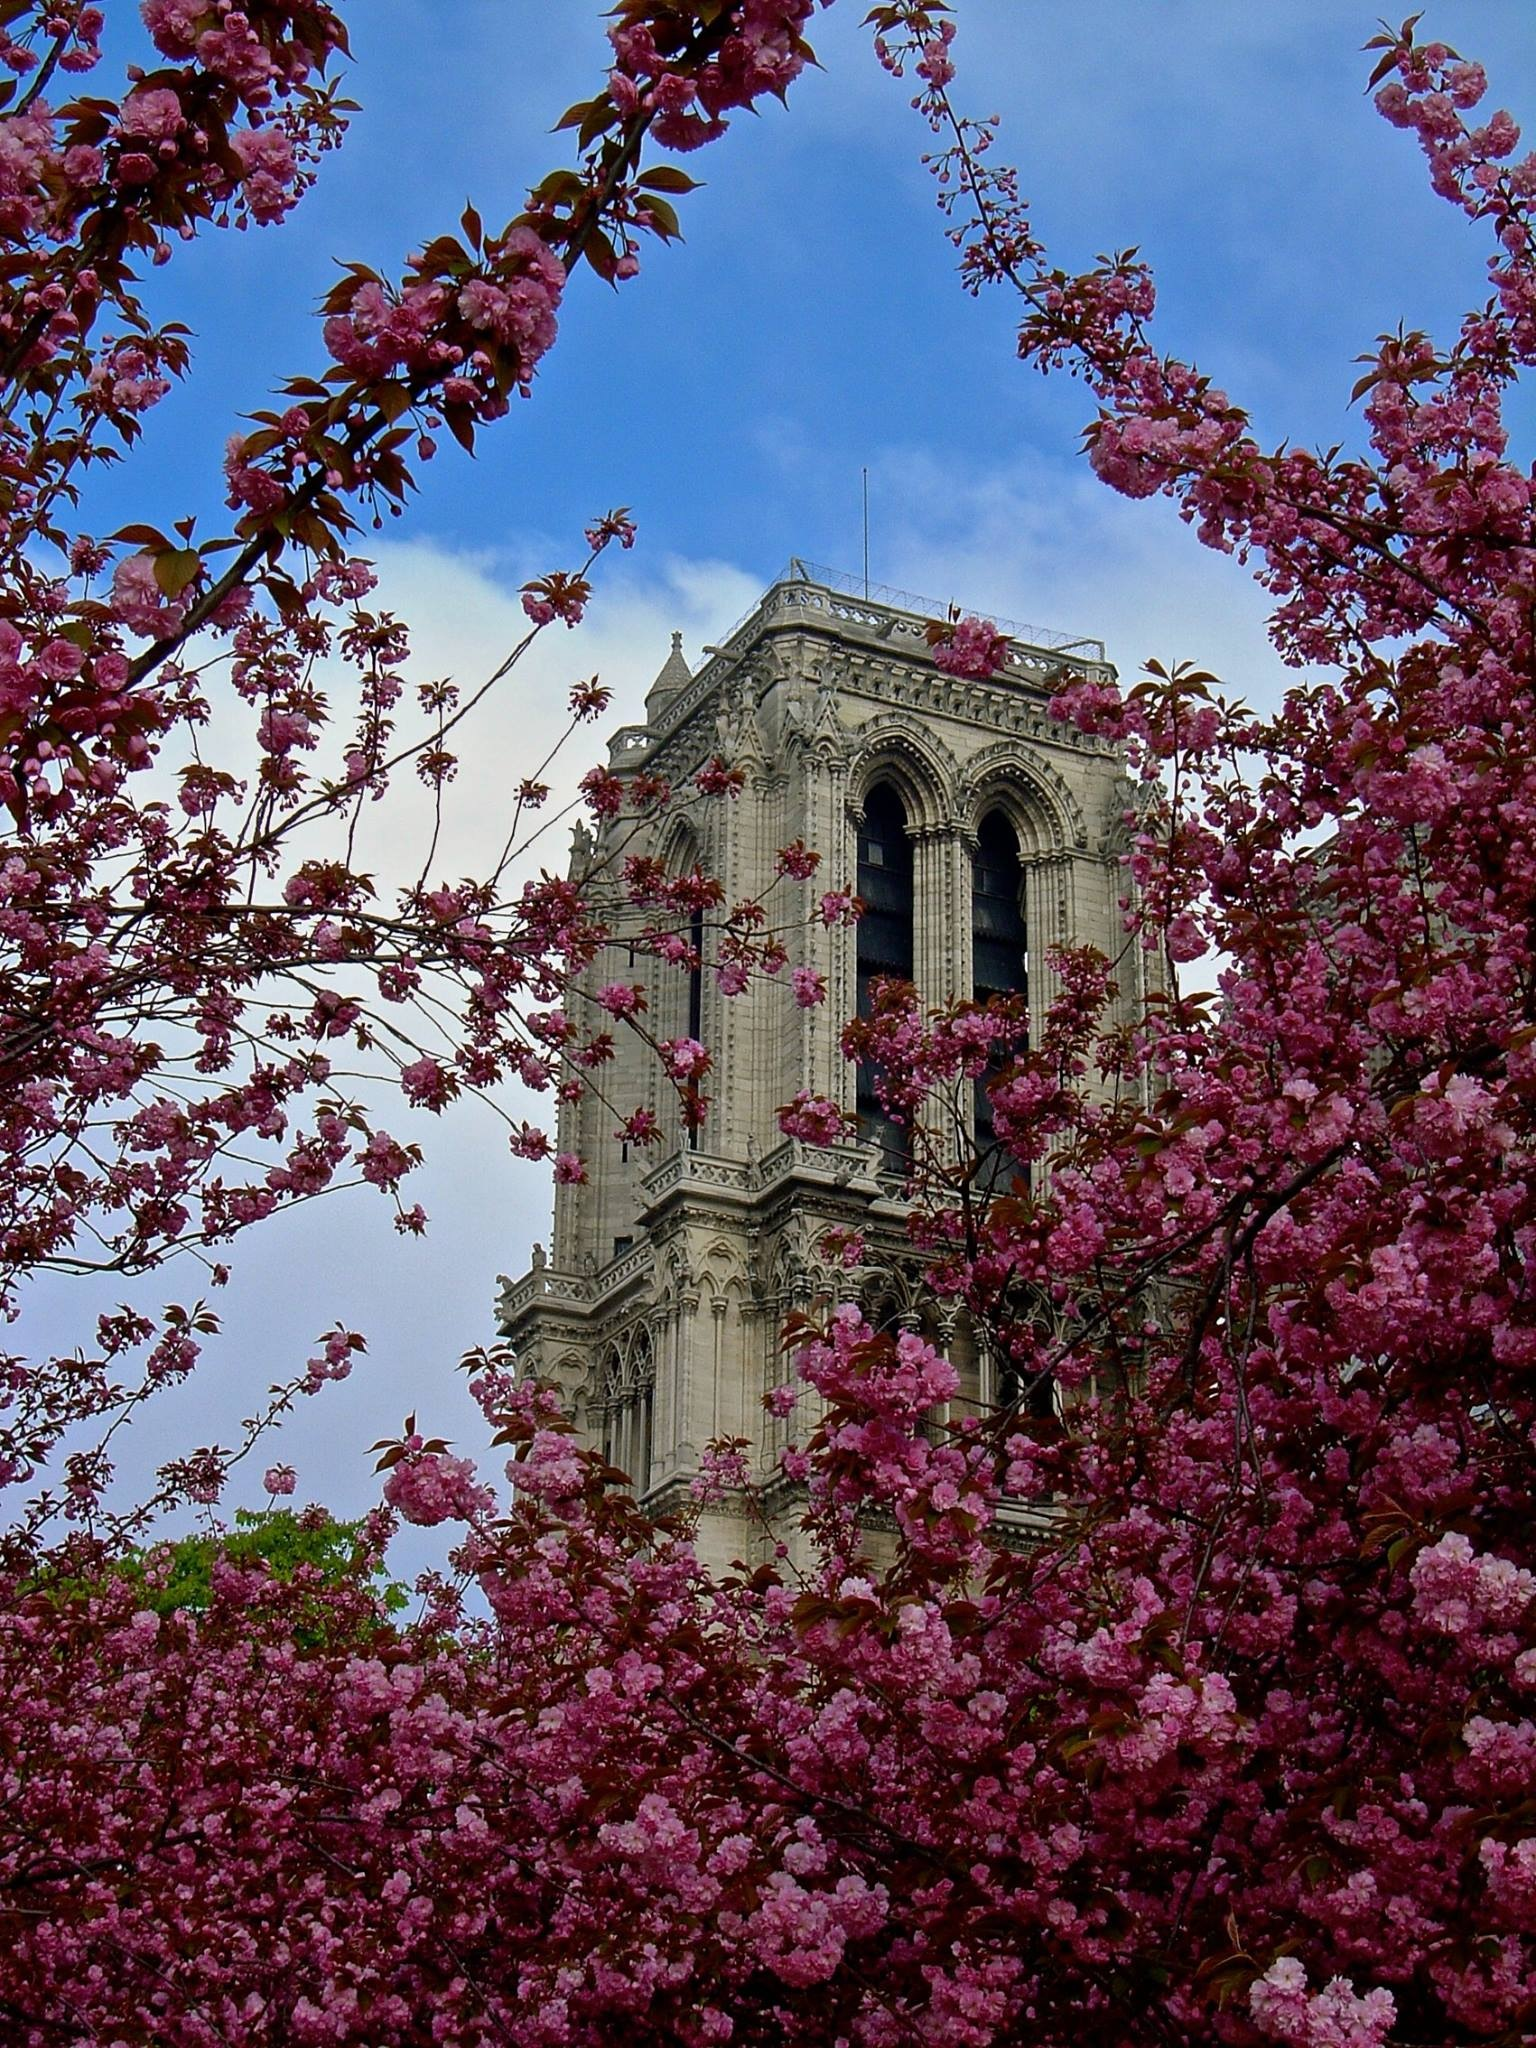 Paris Spring 2018 by Robert Malin Young